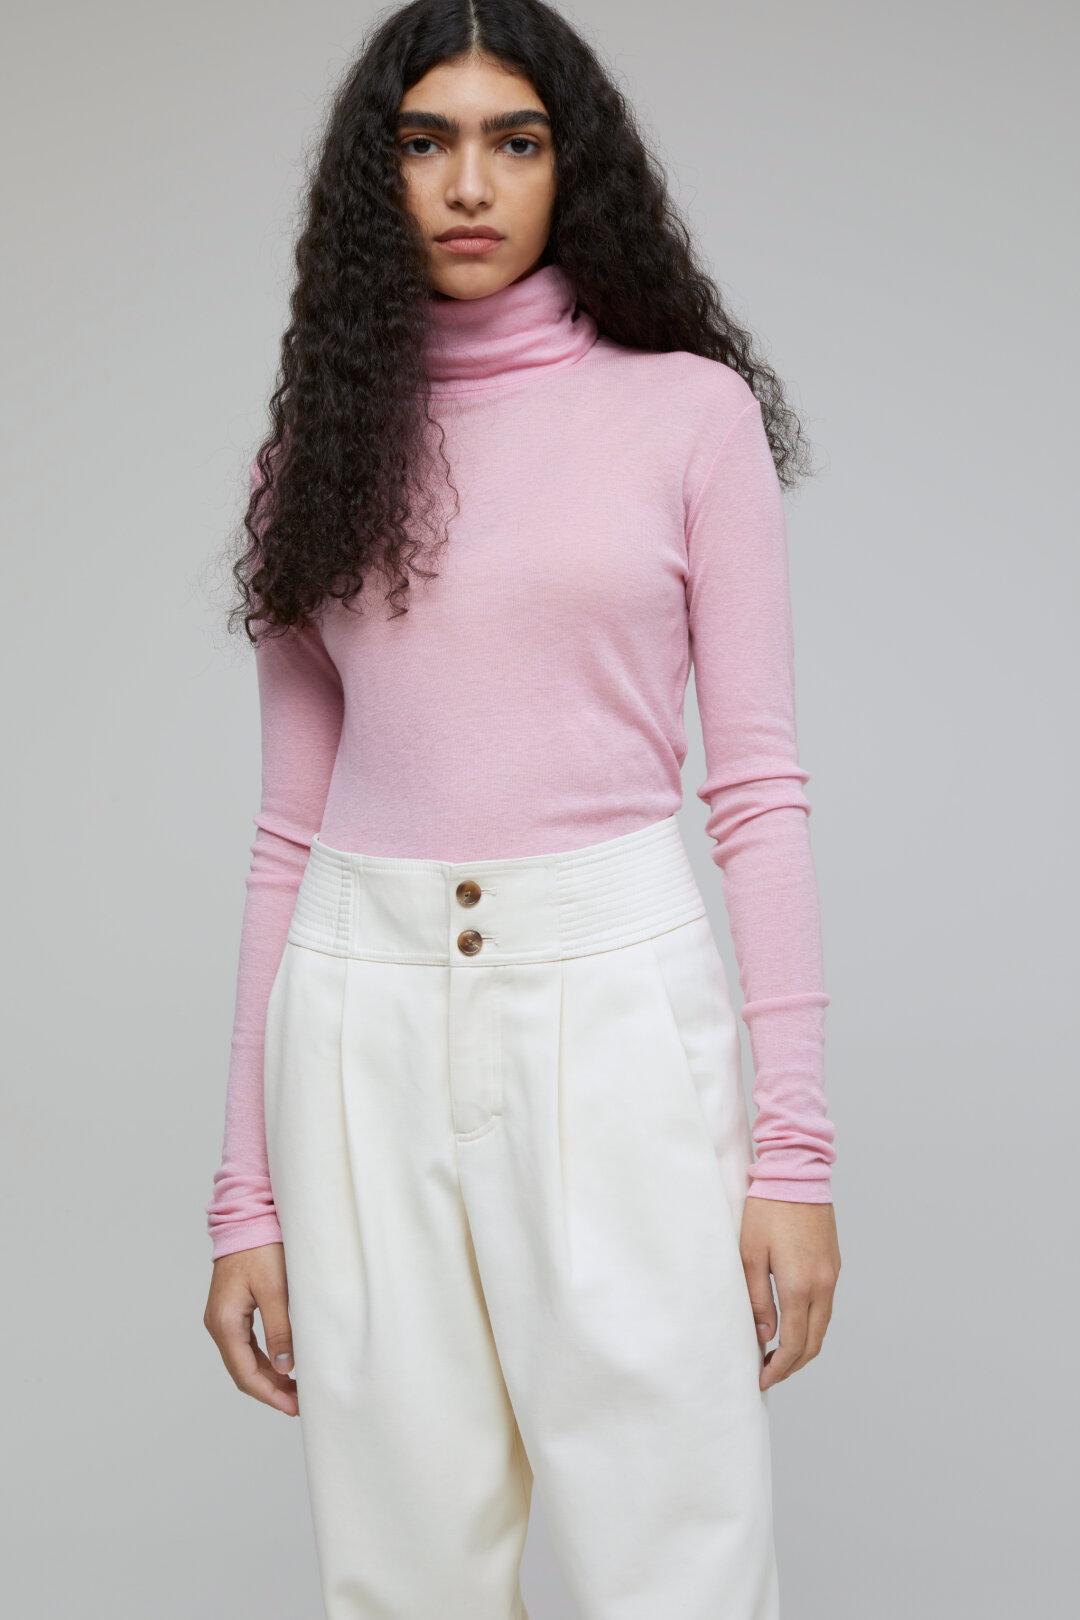 Rollkragenshirt, Closed, pink